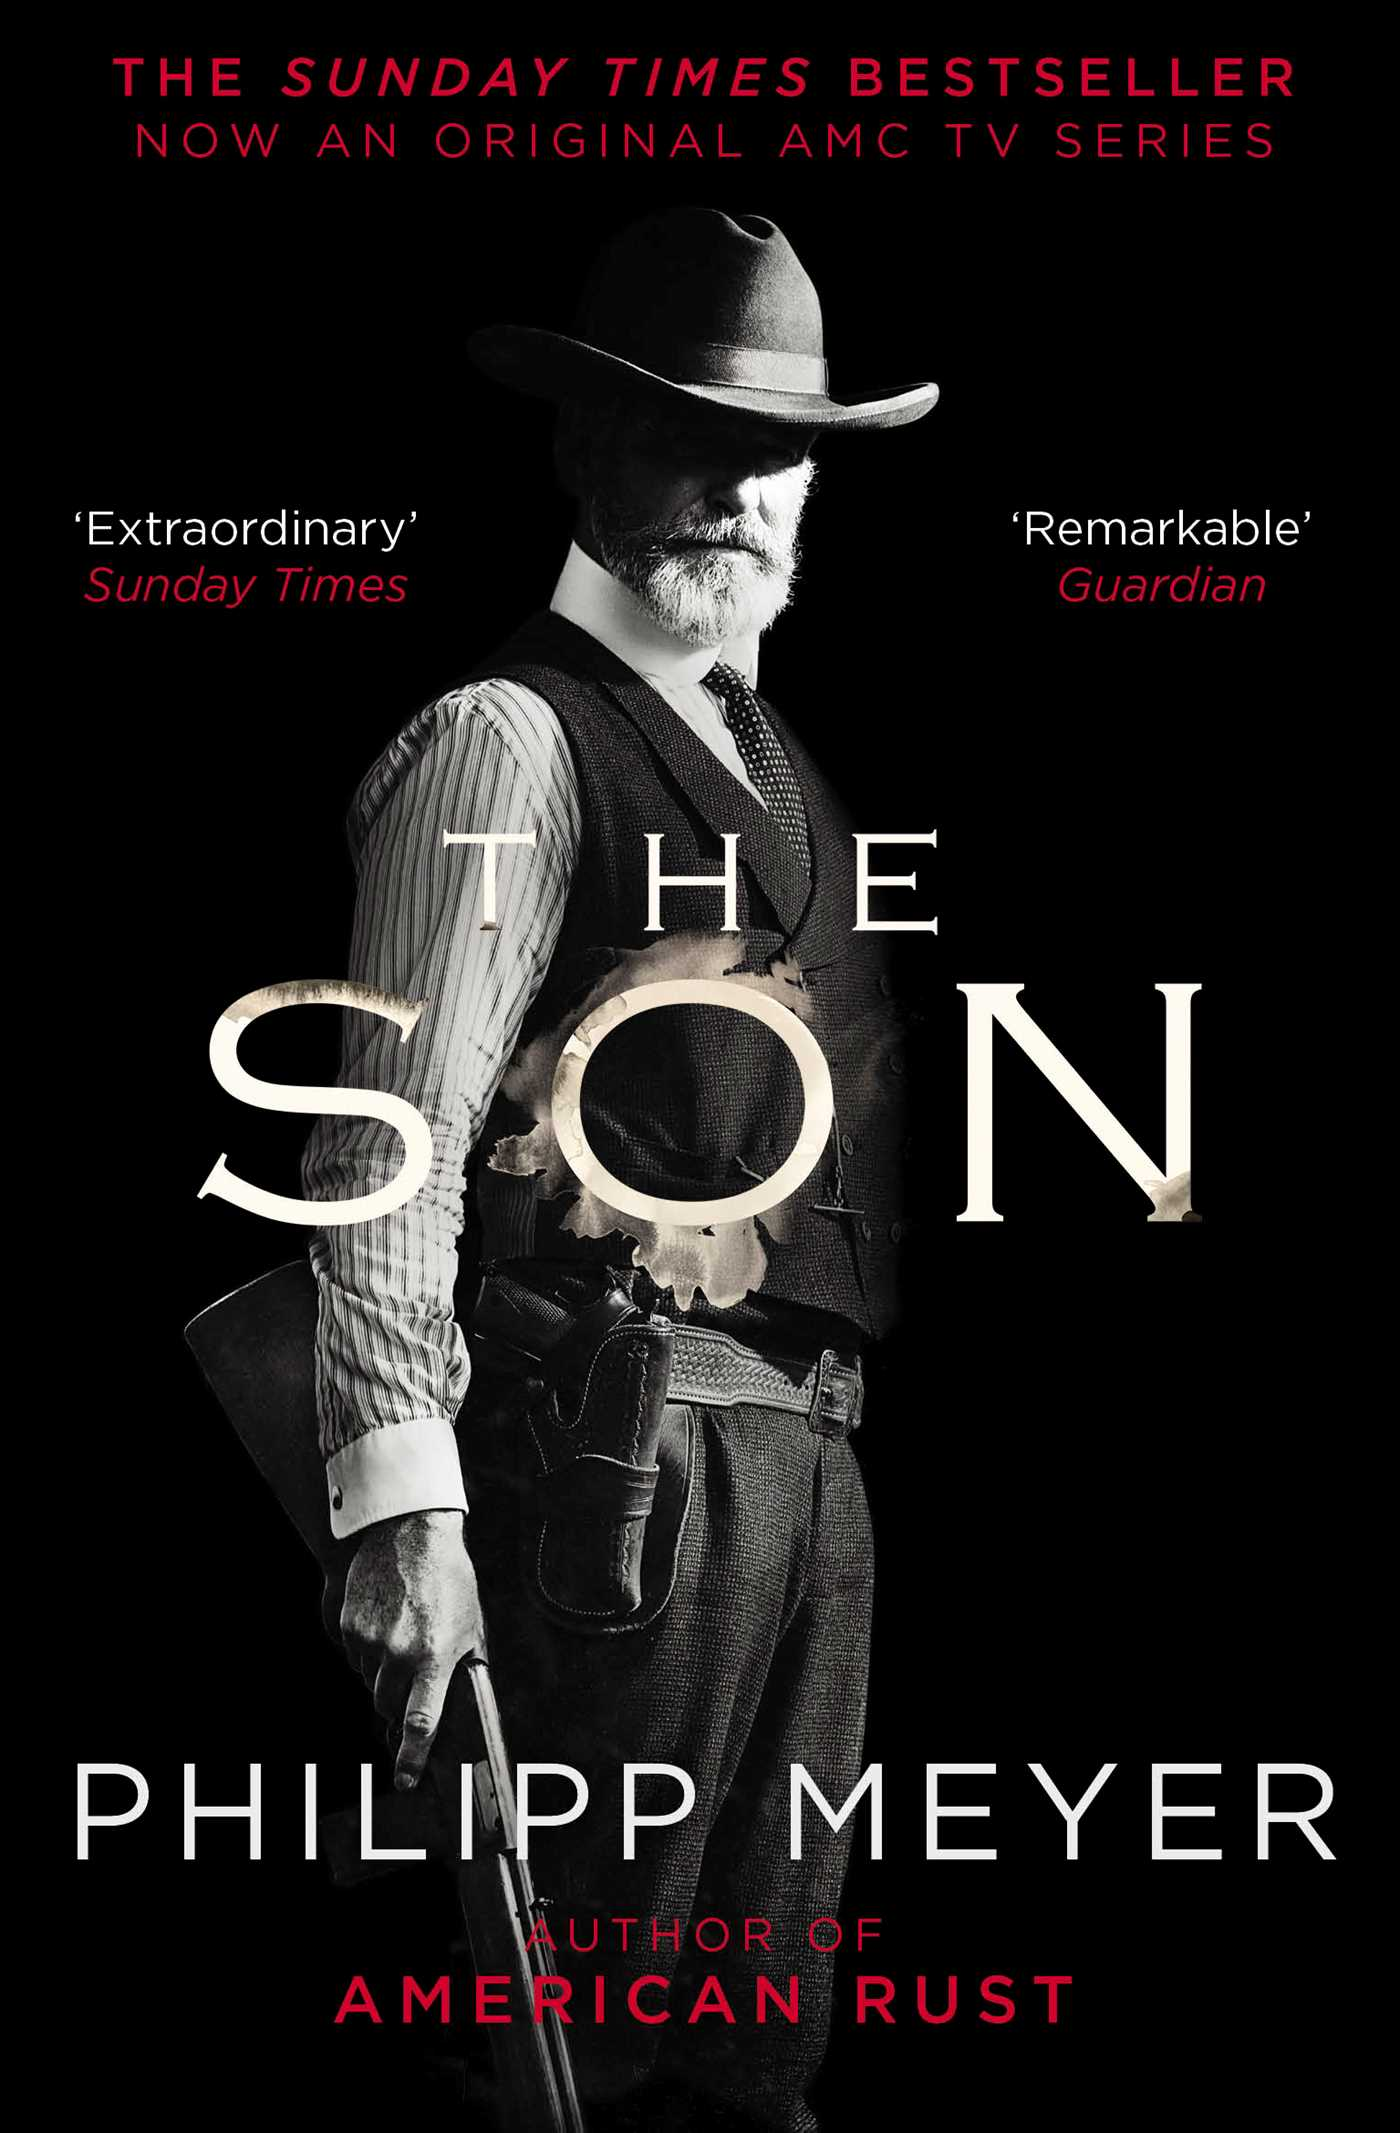 The son 9781471167379 hr